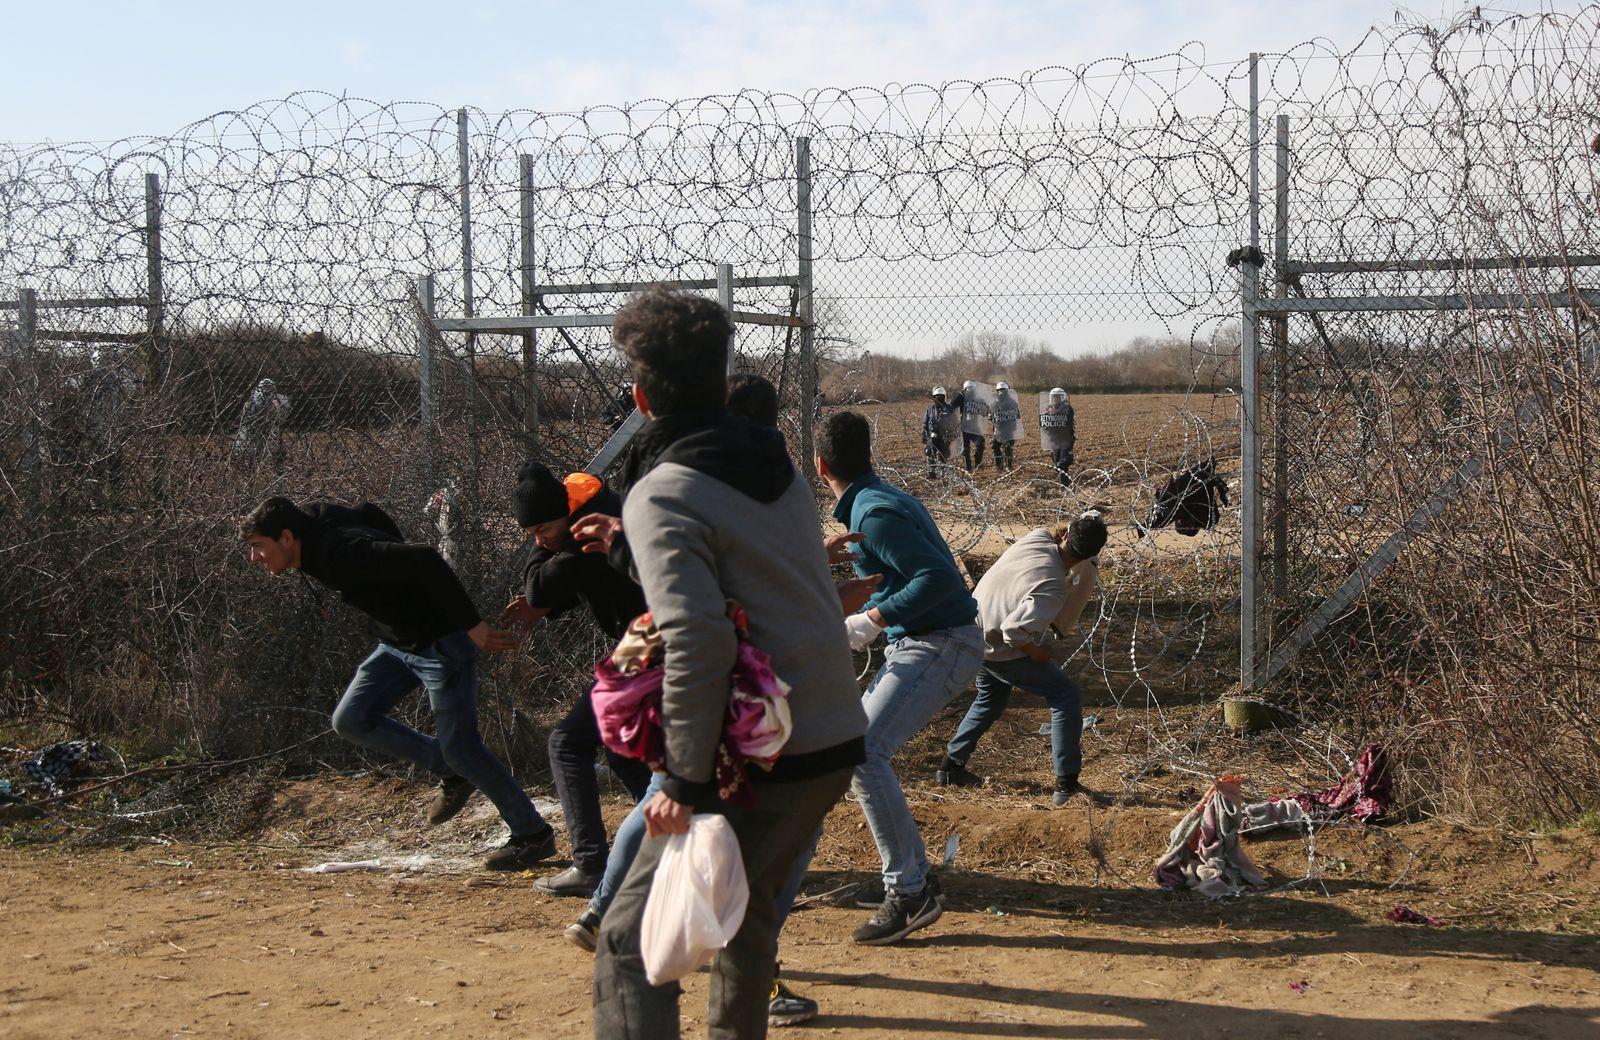 Migrants throw stones at a Greek military vehicle on the Turkish-Greek border at Turkey's Pazarkule border crossing with Greece's Kastanies, near Edirne